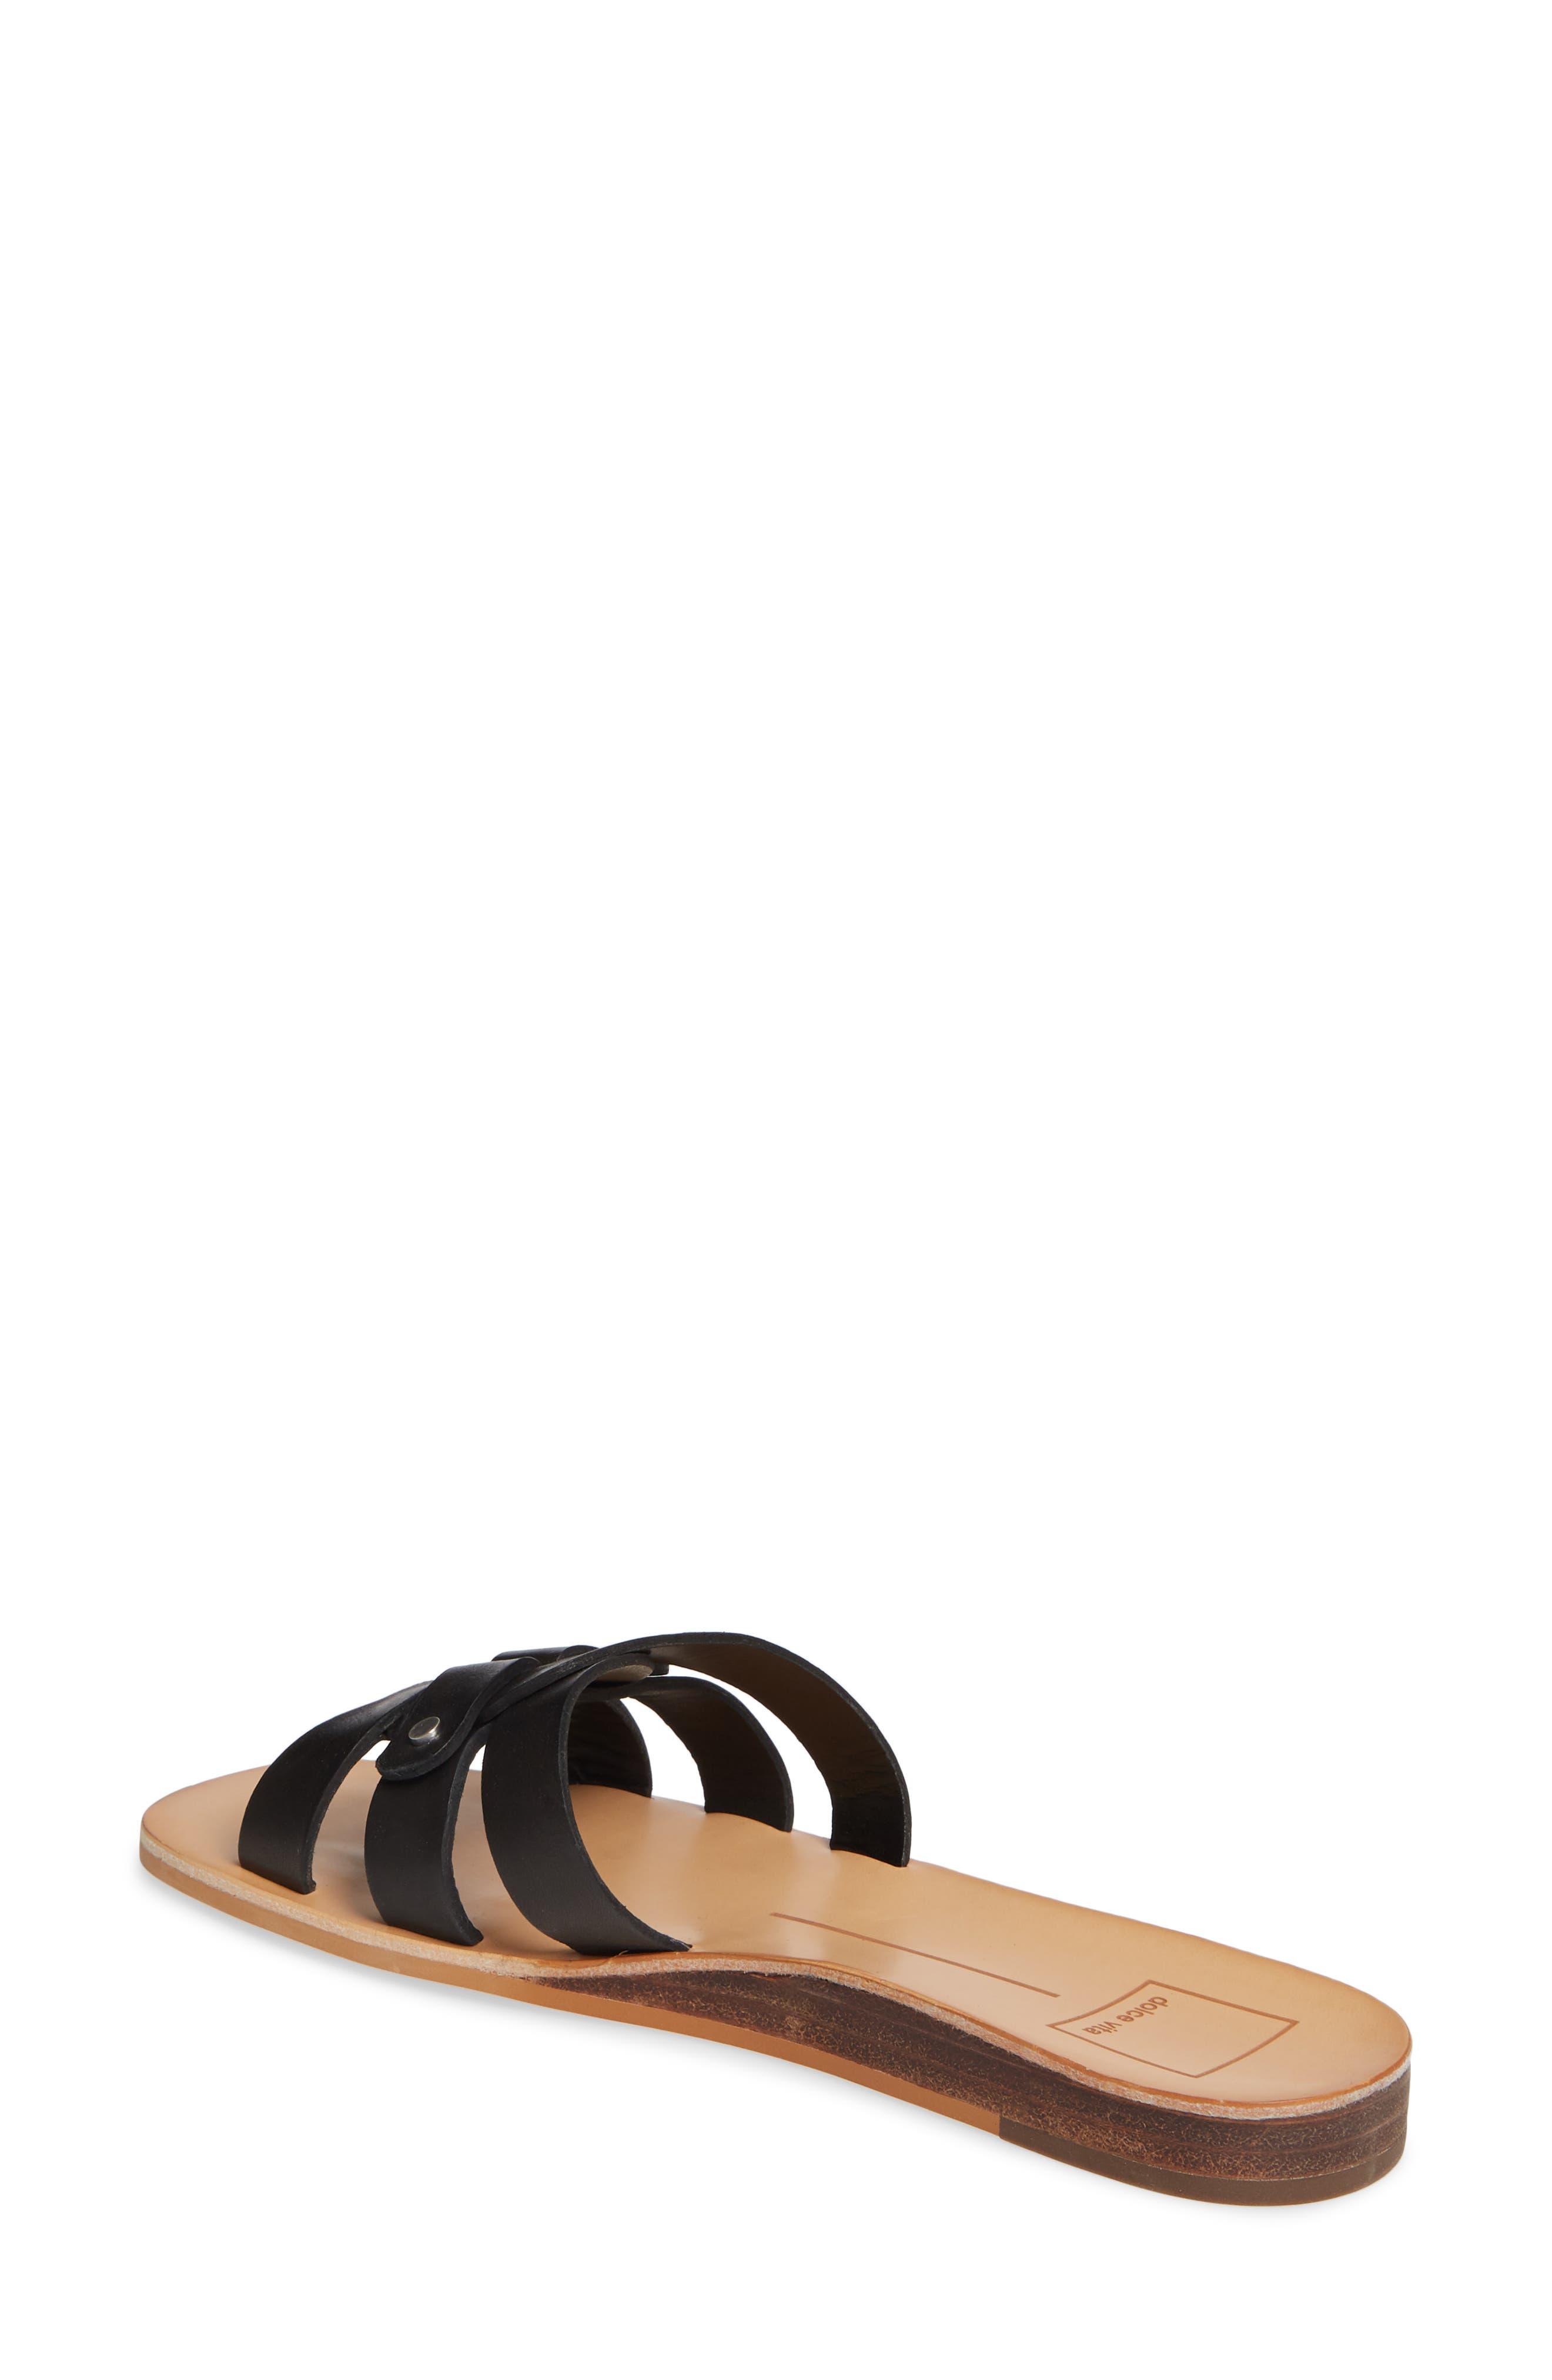 DOLCE VITA, Cait Slide Sandal, Alternate thumbnail 2, color, BLACK LEATHER